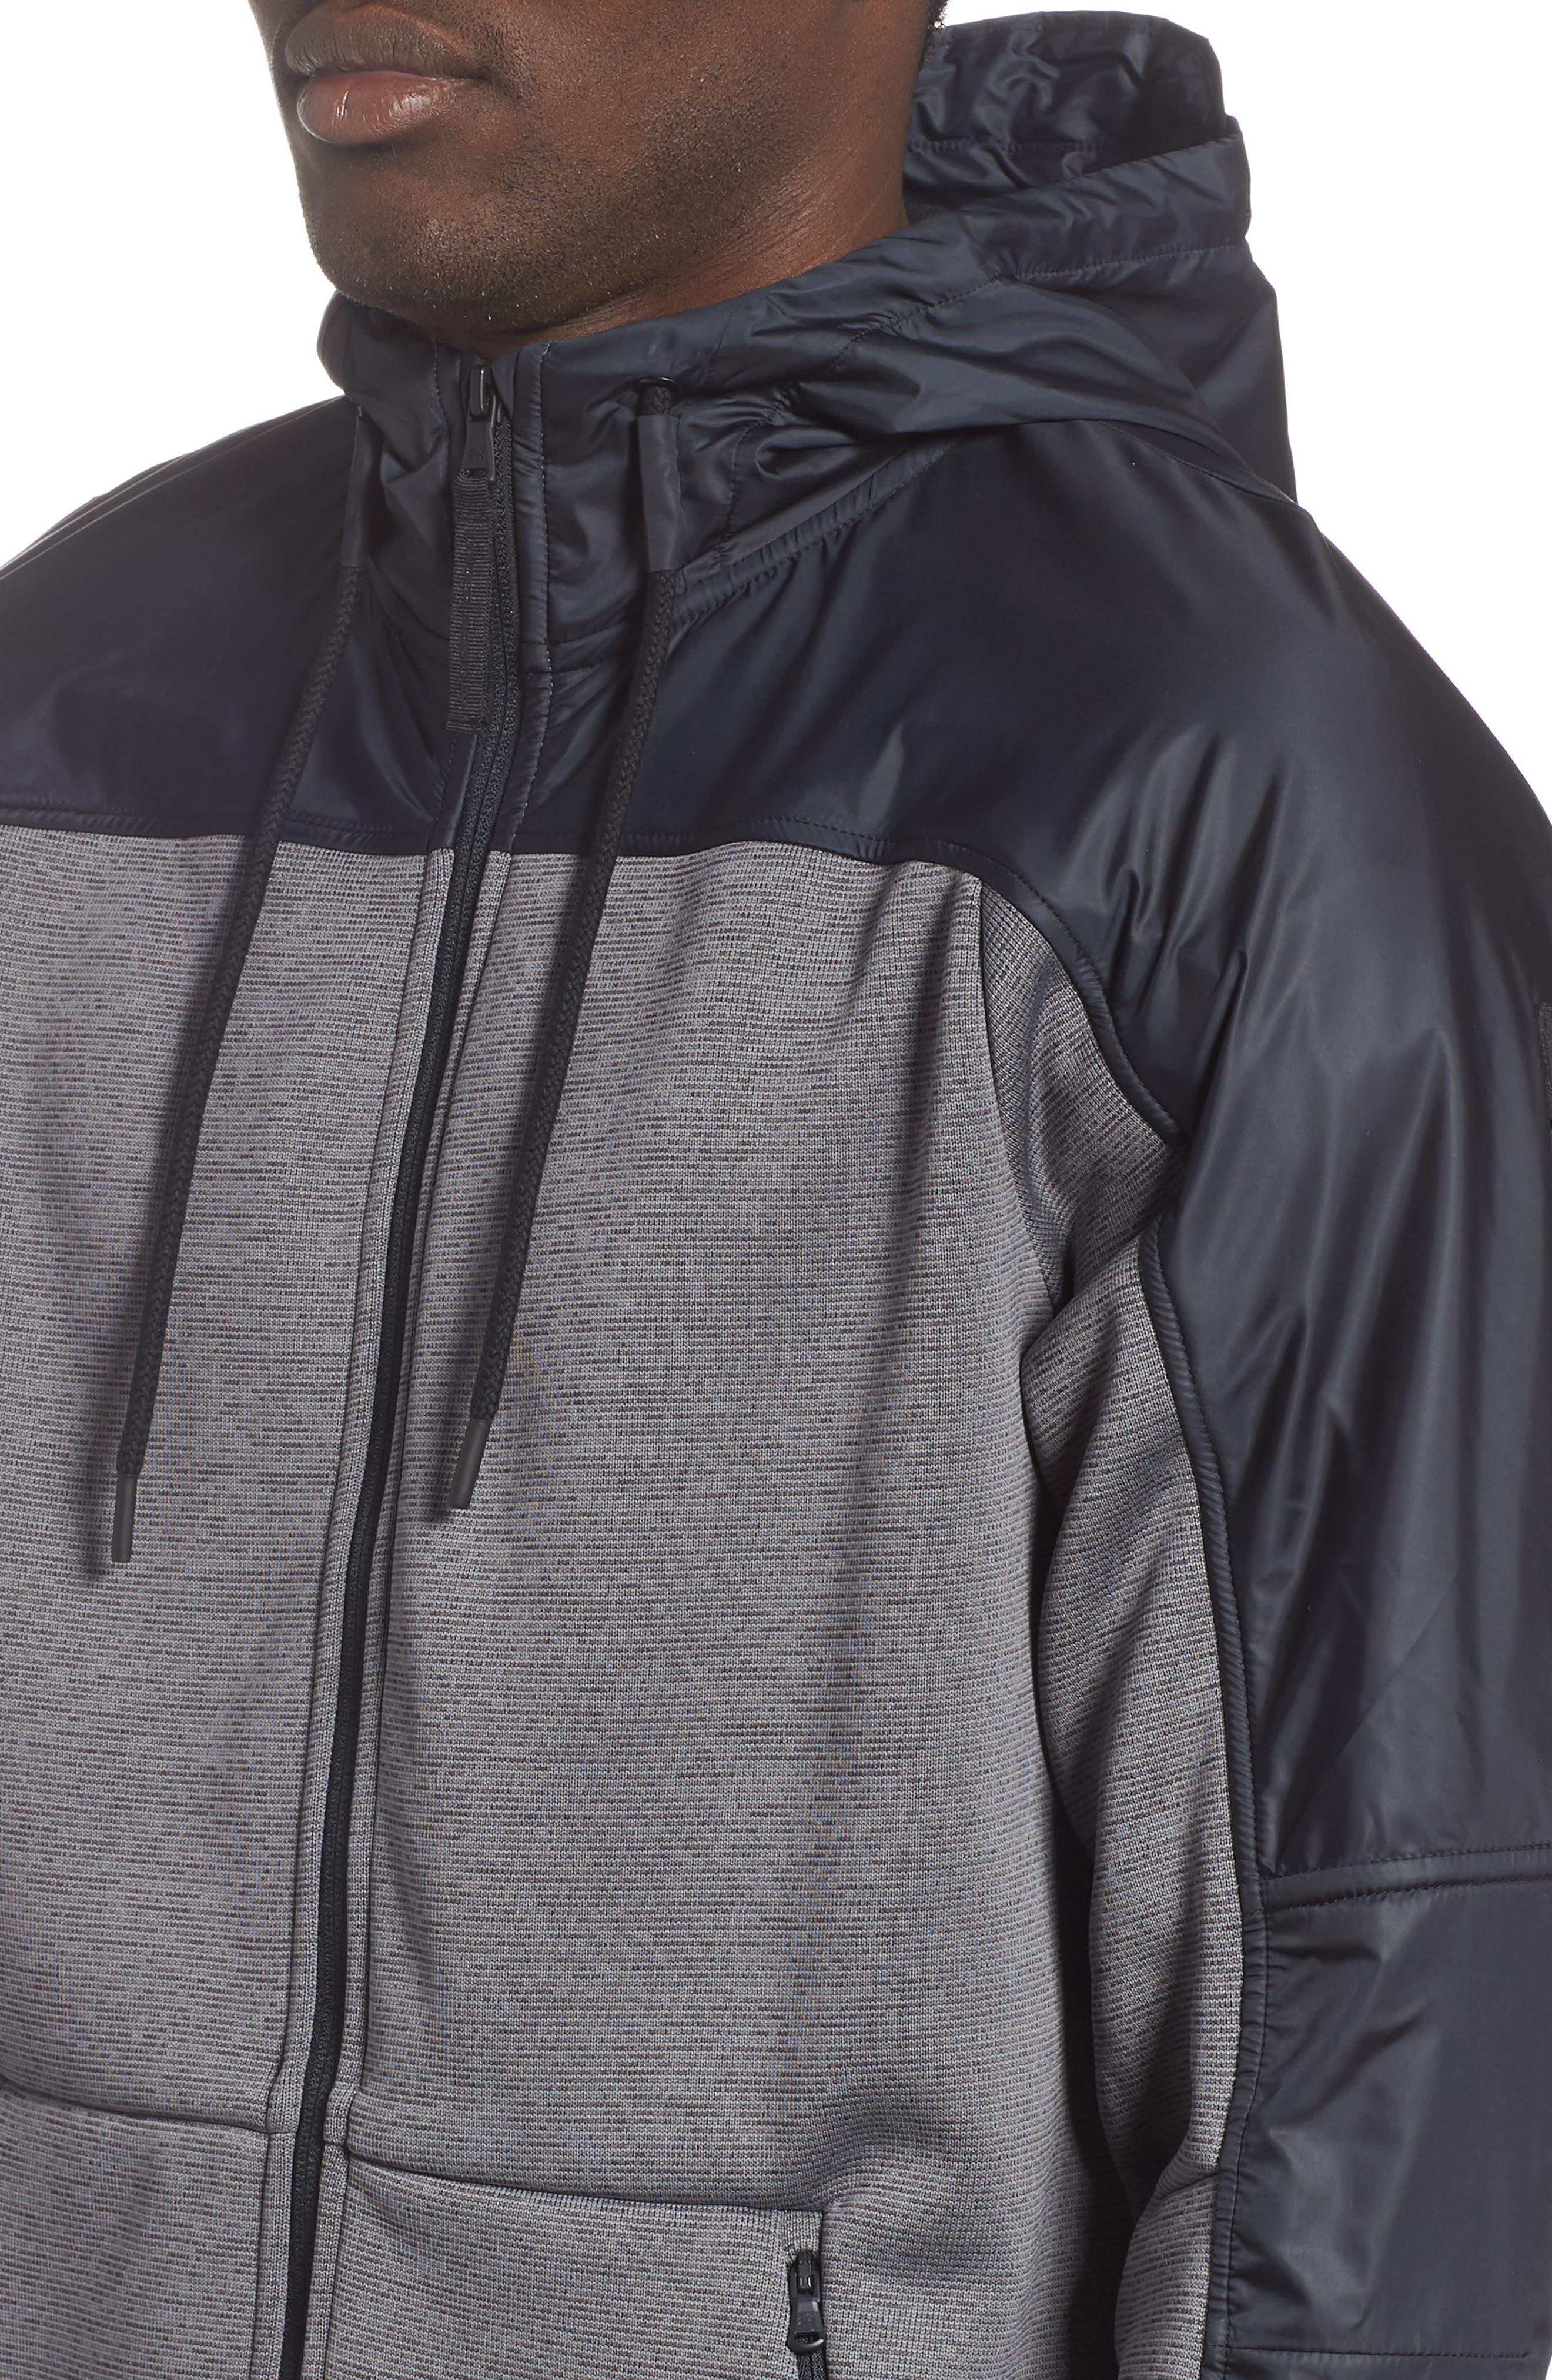 Unstoppable ColdGear<sup>®</sup> Jacket,                             Alternate thumbnail 4, color,                             CHARCOAL/ BLACK